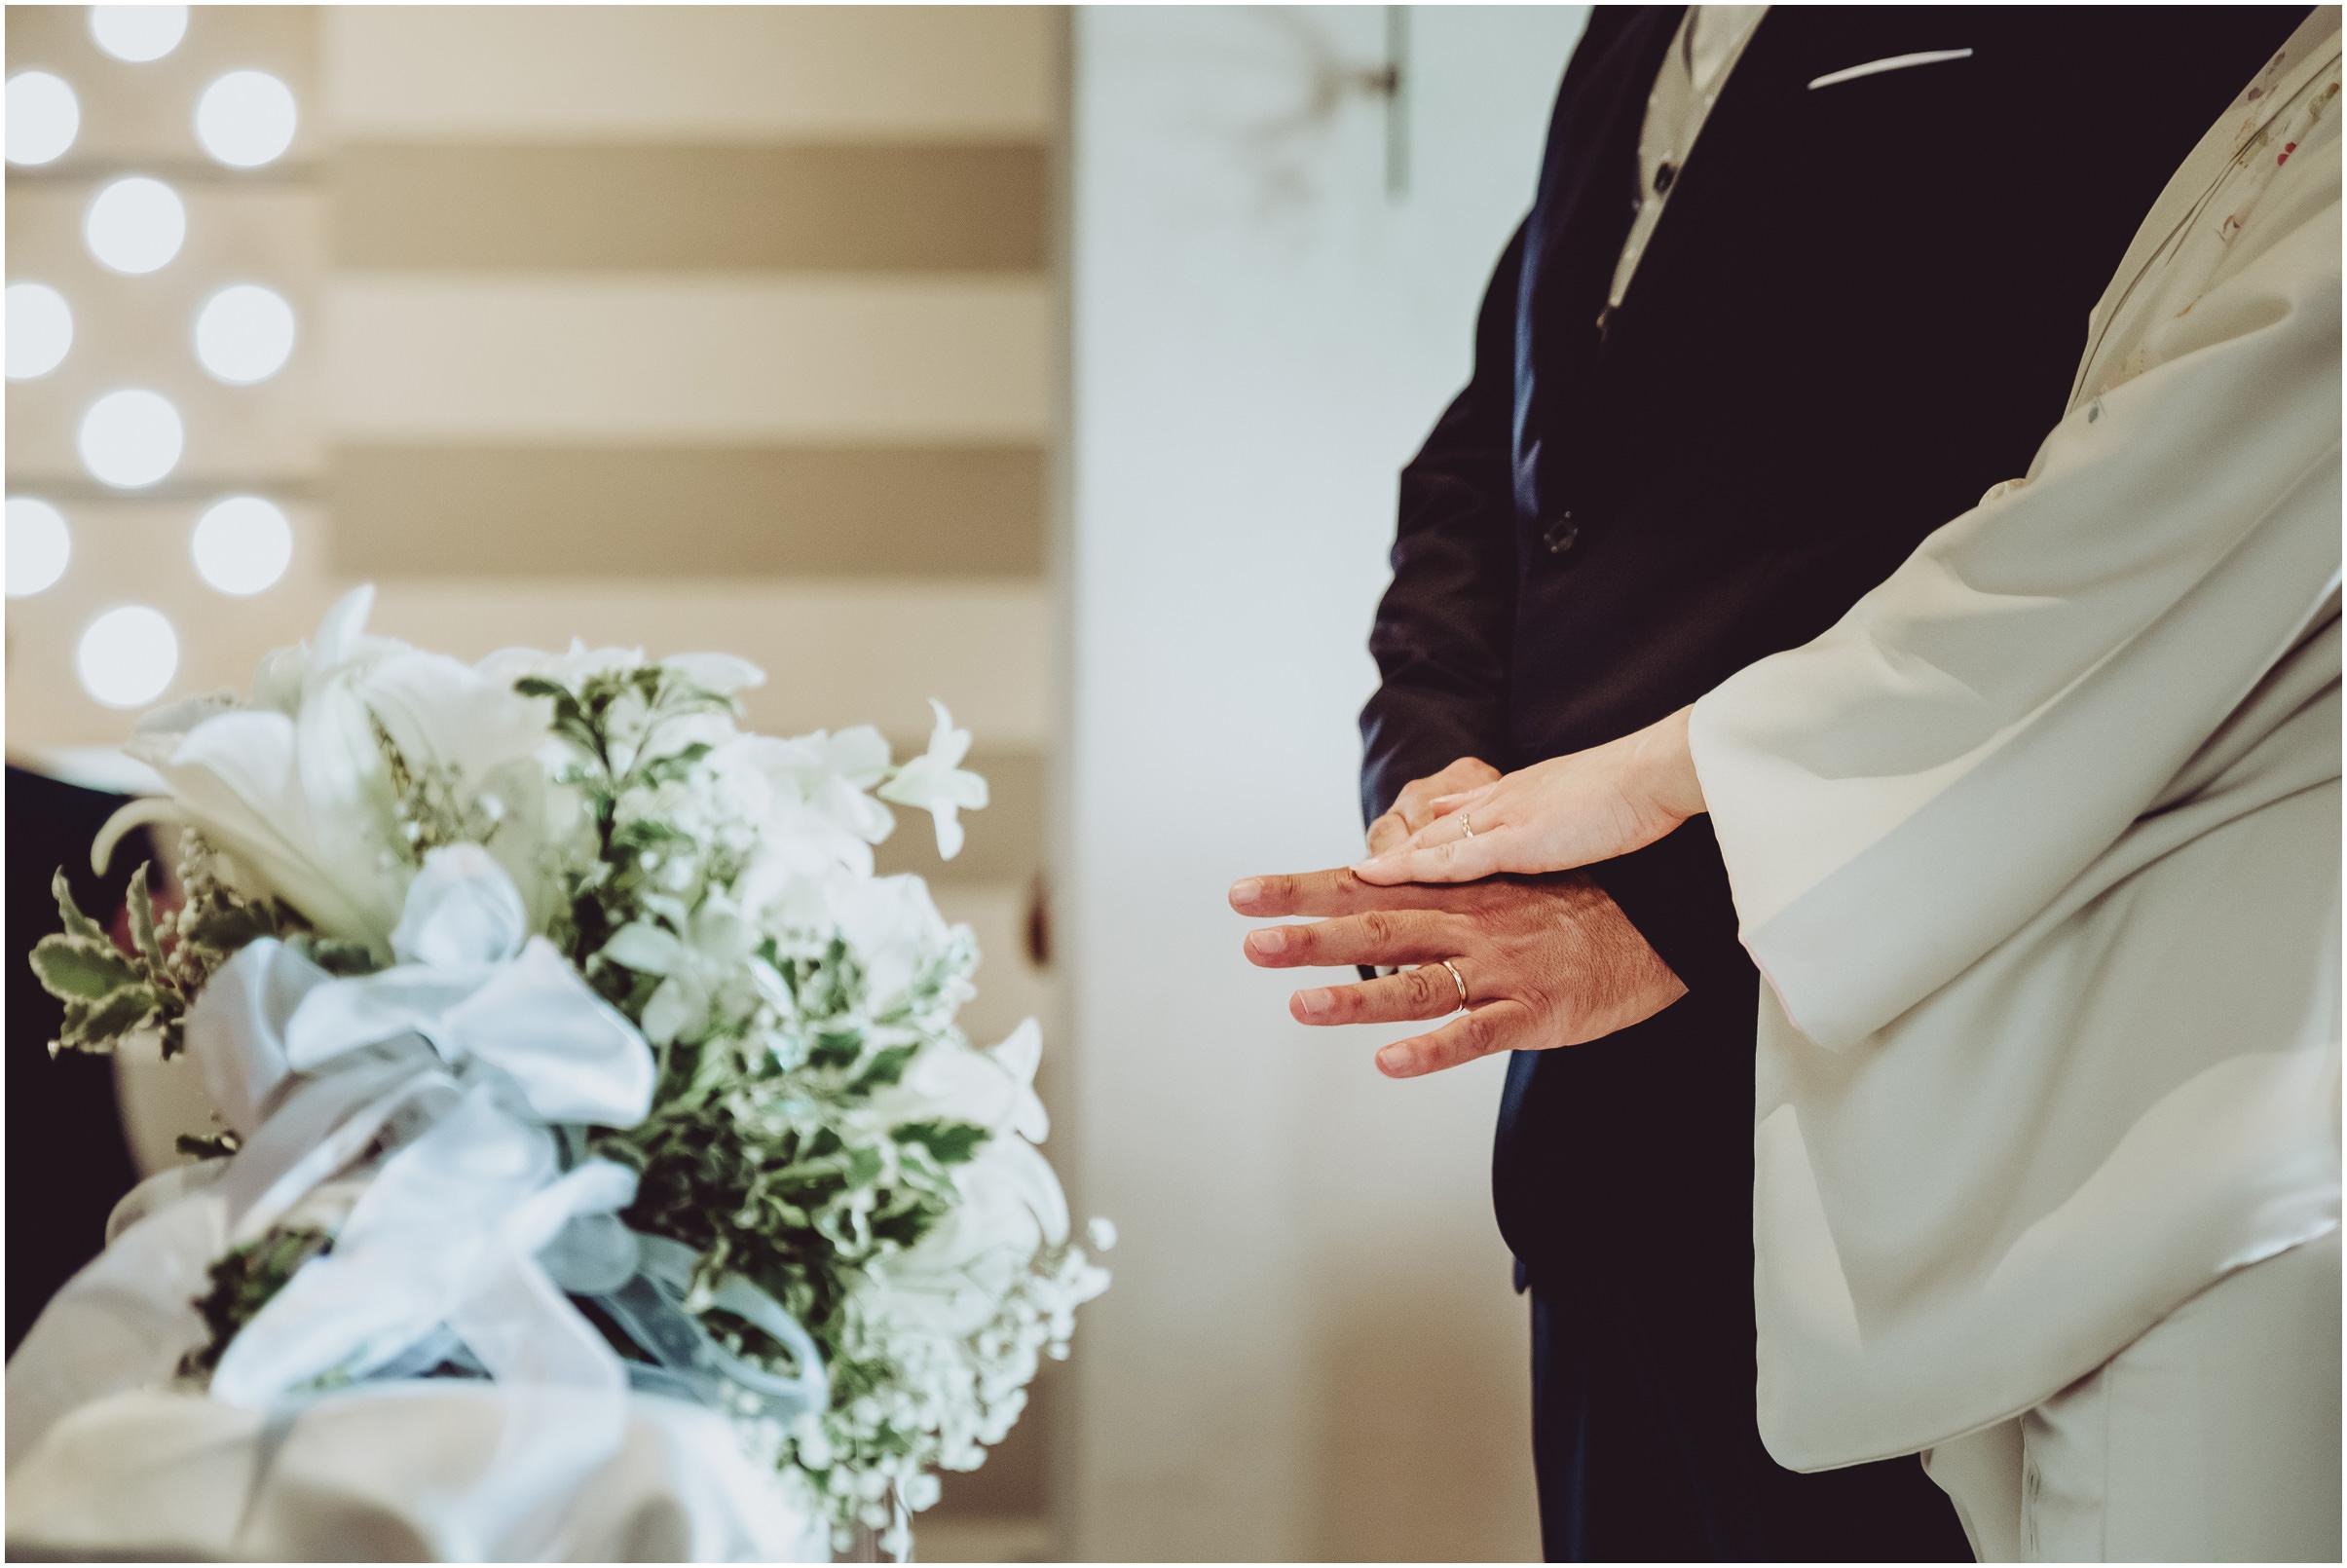 WEDDING-PHOTOGRAPHY-SARA-LORENZONI-FOTOGRAFIA-MATRIMONIO-ORVIETO-JUKA-ANTONELLO22